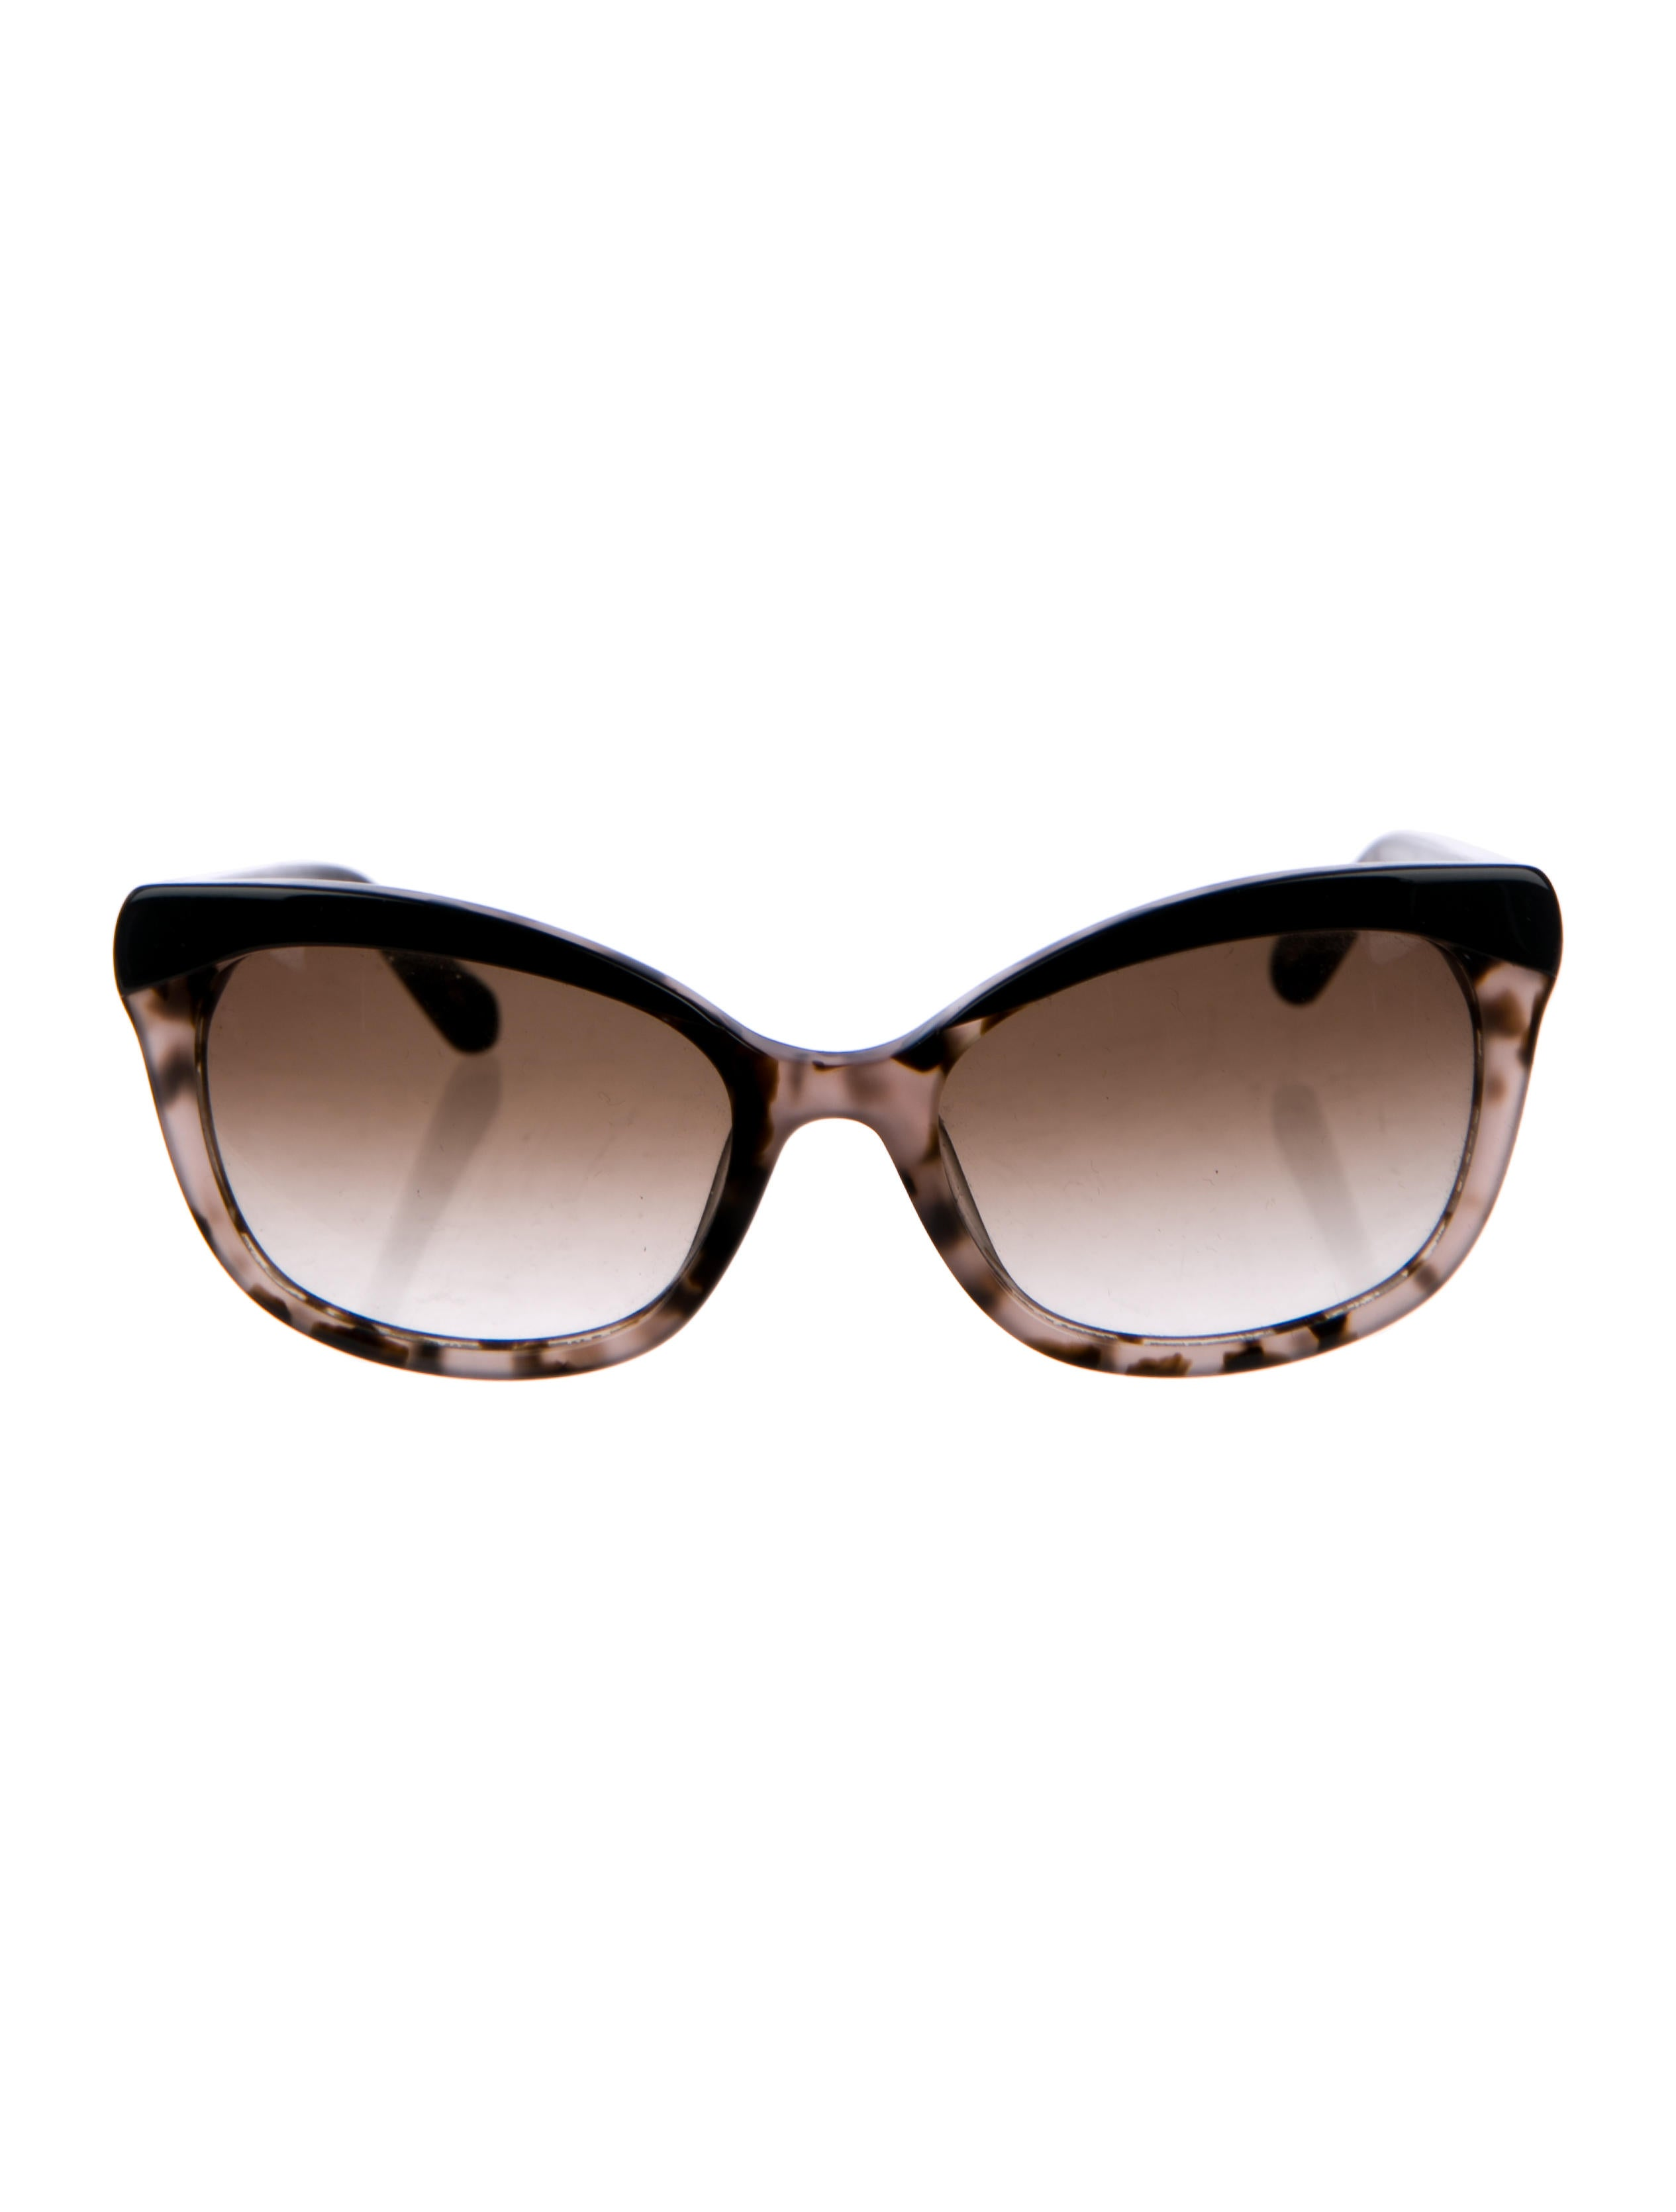 bcbafaf550cc Kate Spade New York Amara Cat-Eye Sunglasses - Accessories ...